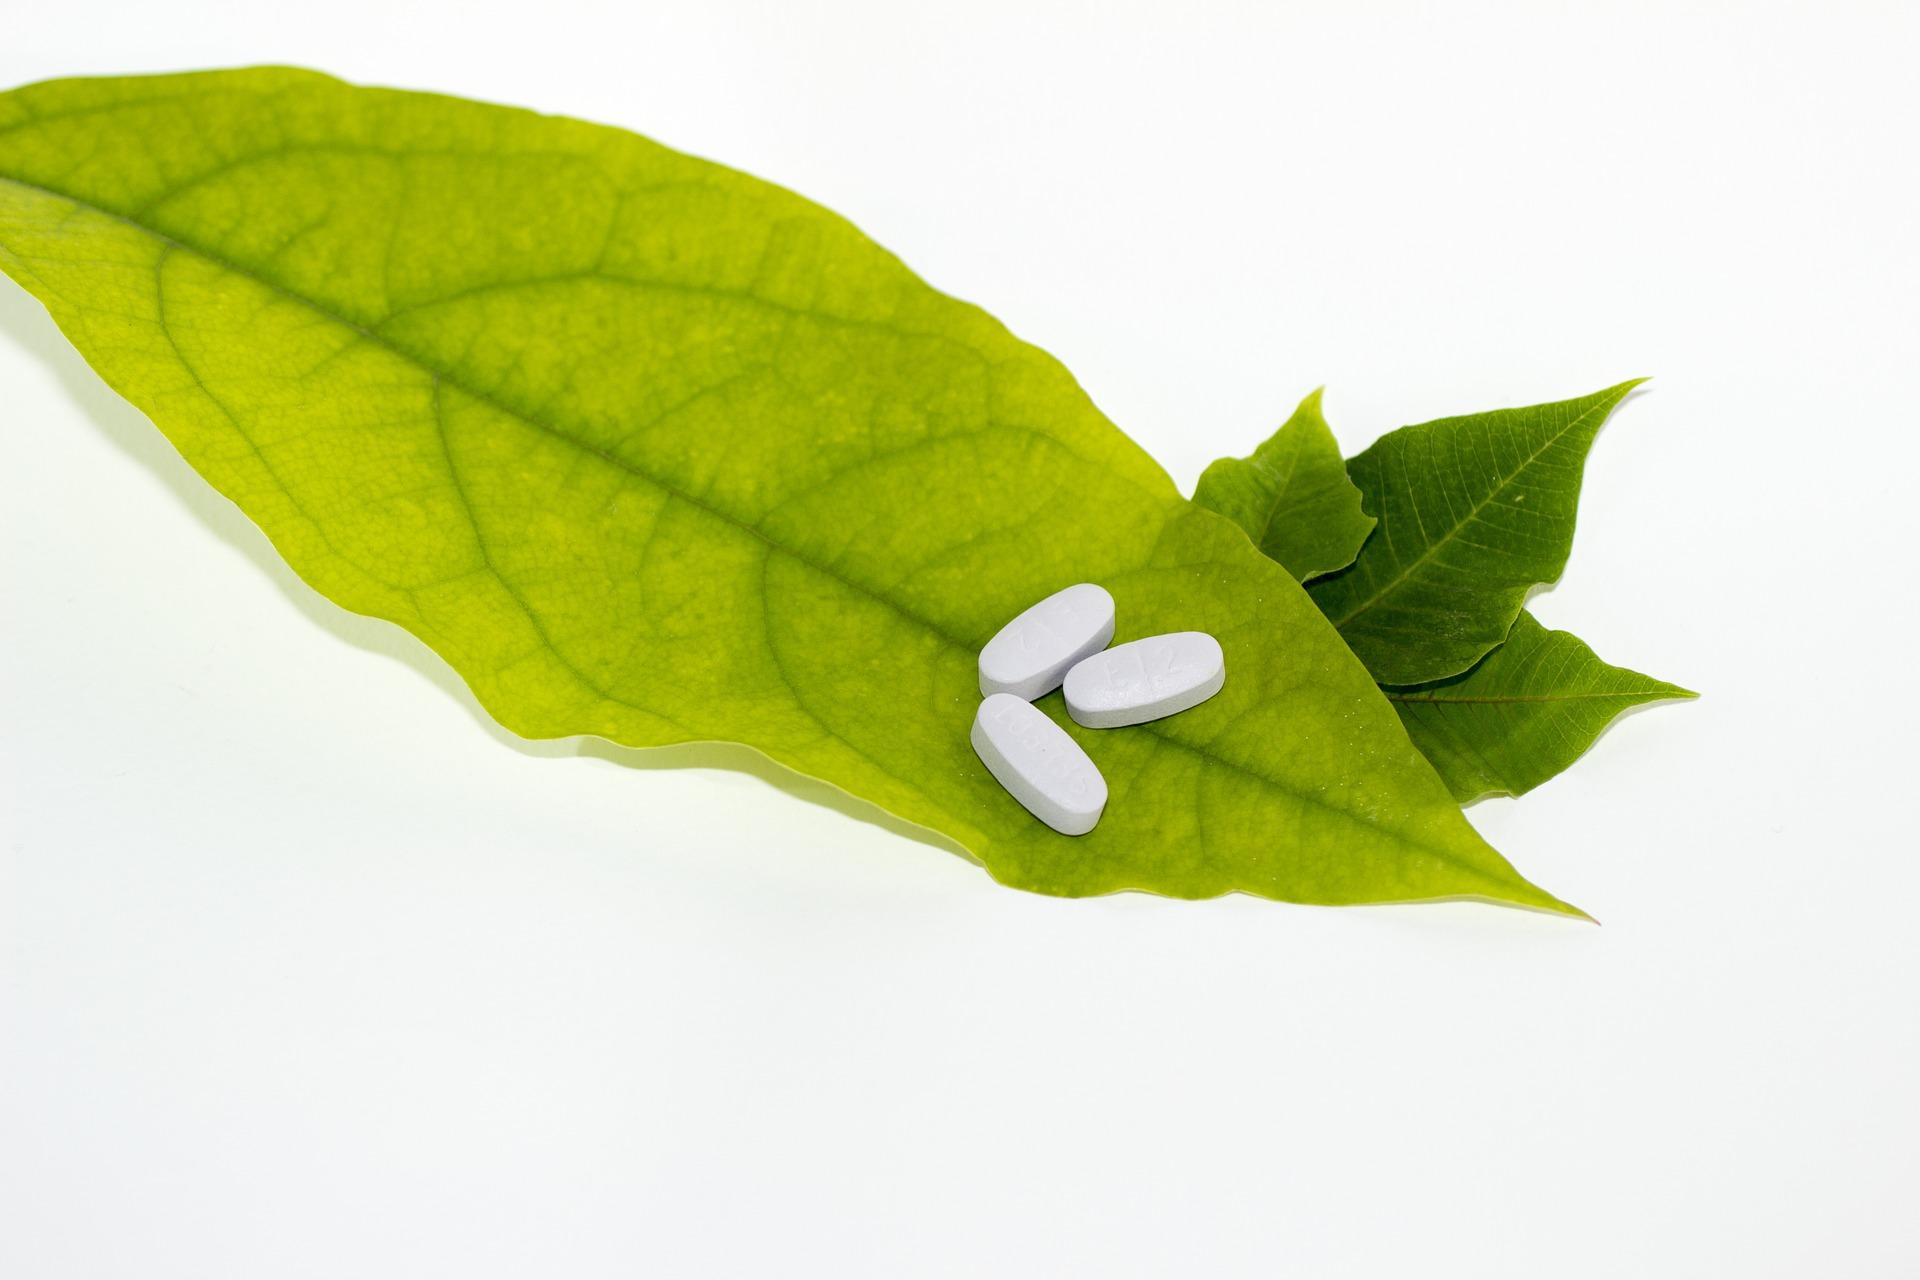 leaf 681122 1920 - 'Crosspathy'  allowing BAMS graduates to prescribe  drugs of modern medicine is 'Statutory Quackery' :IMA